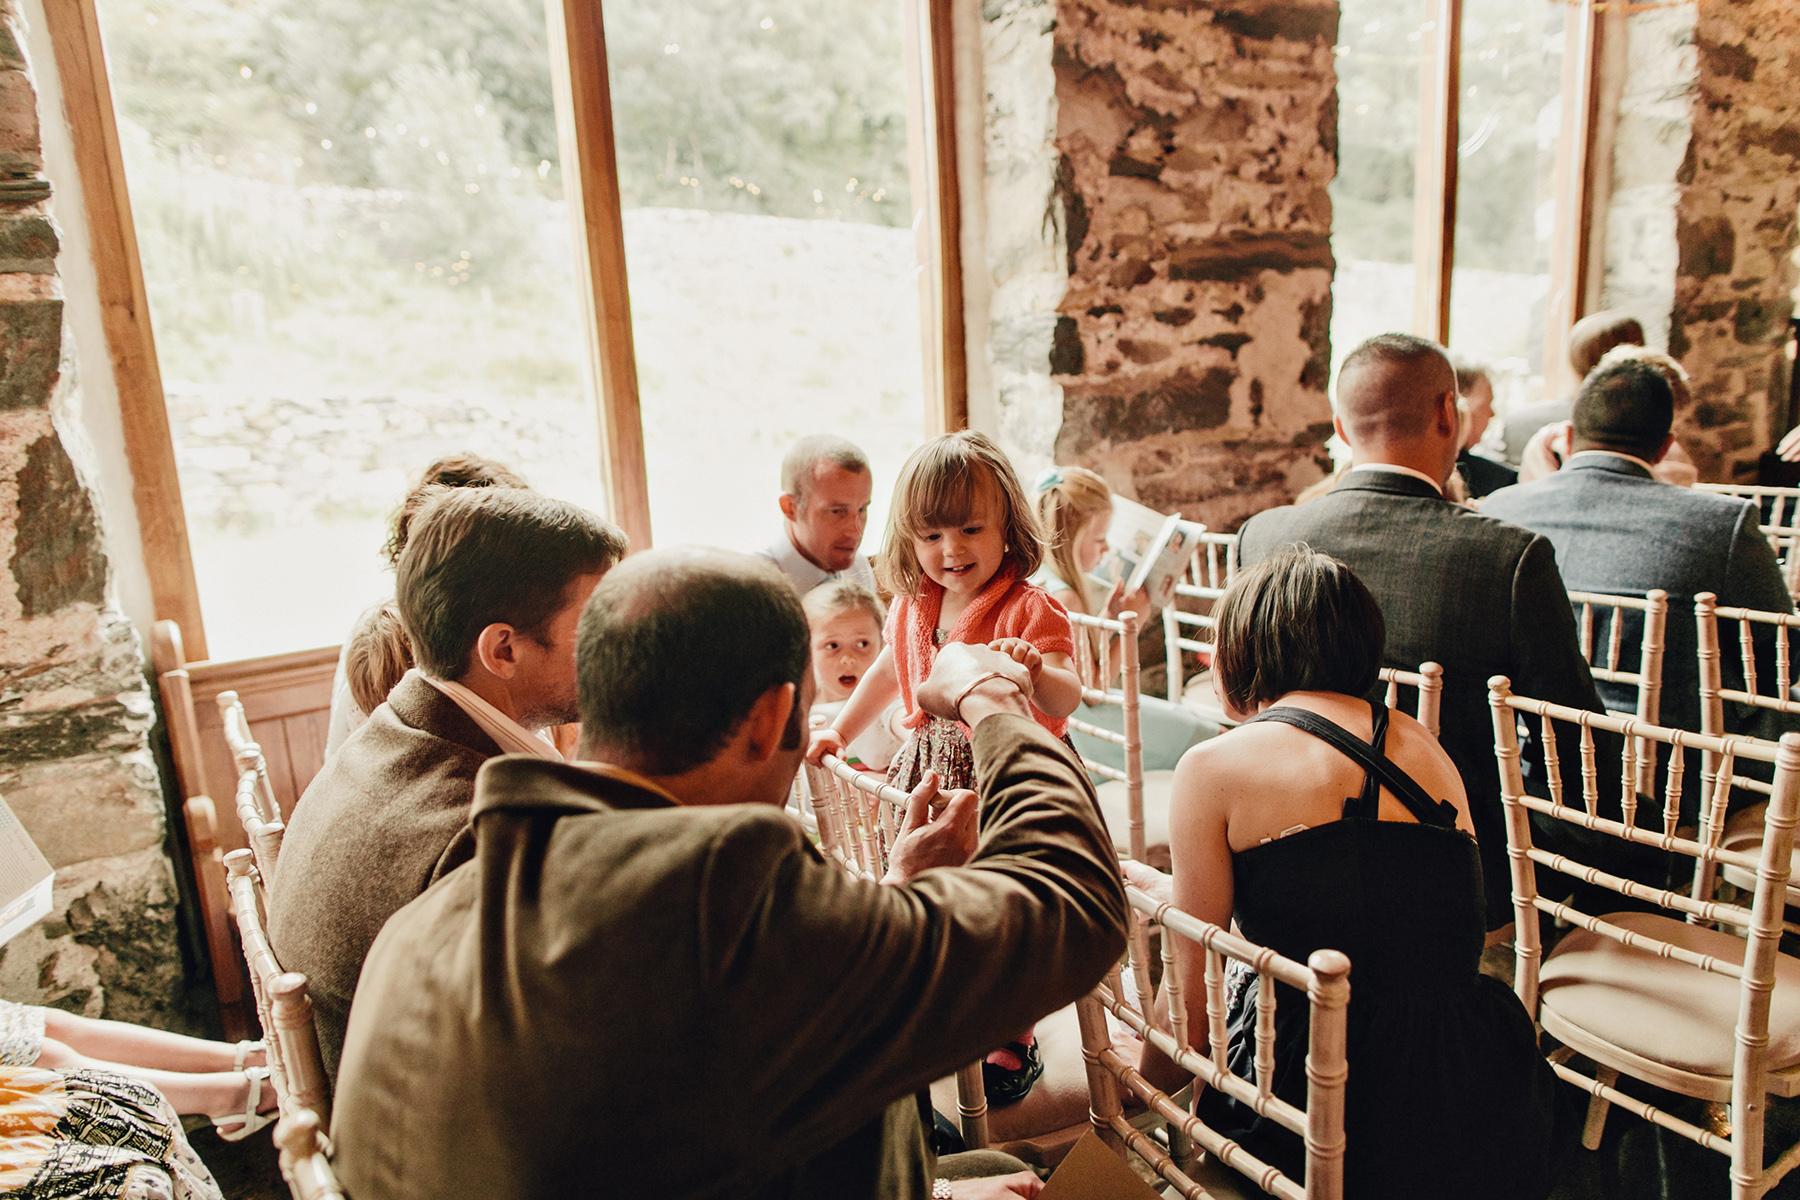 Snowdonia-Wales-Wedding-Photos-0314.jpg